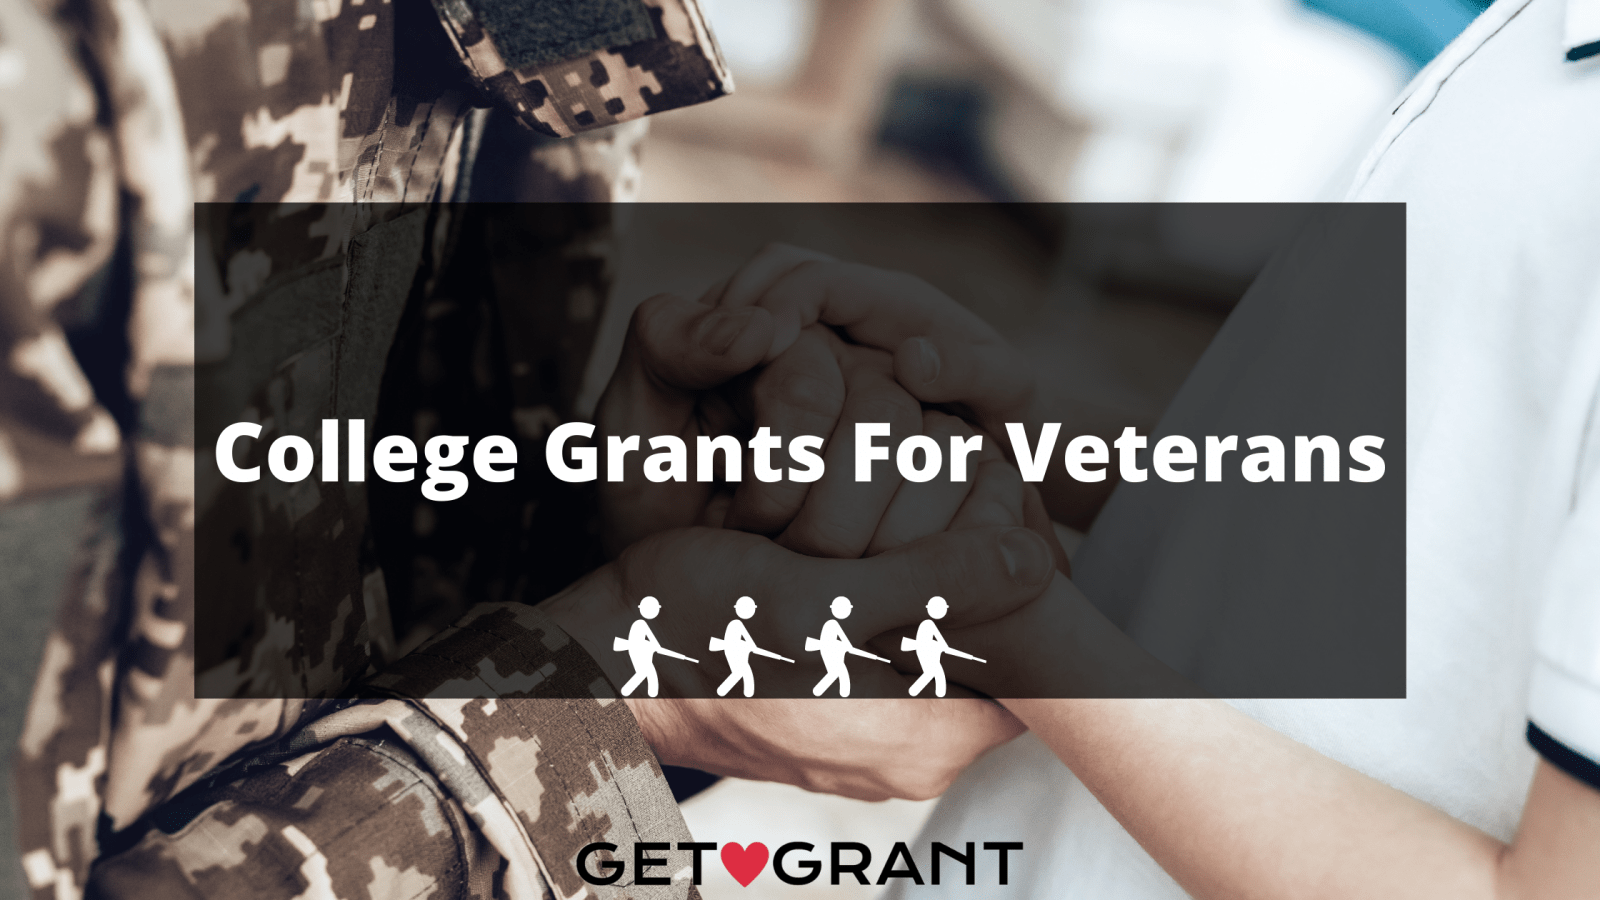 College Grants For Veterans